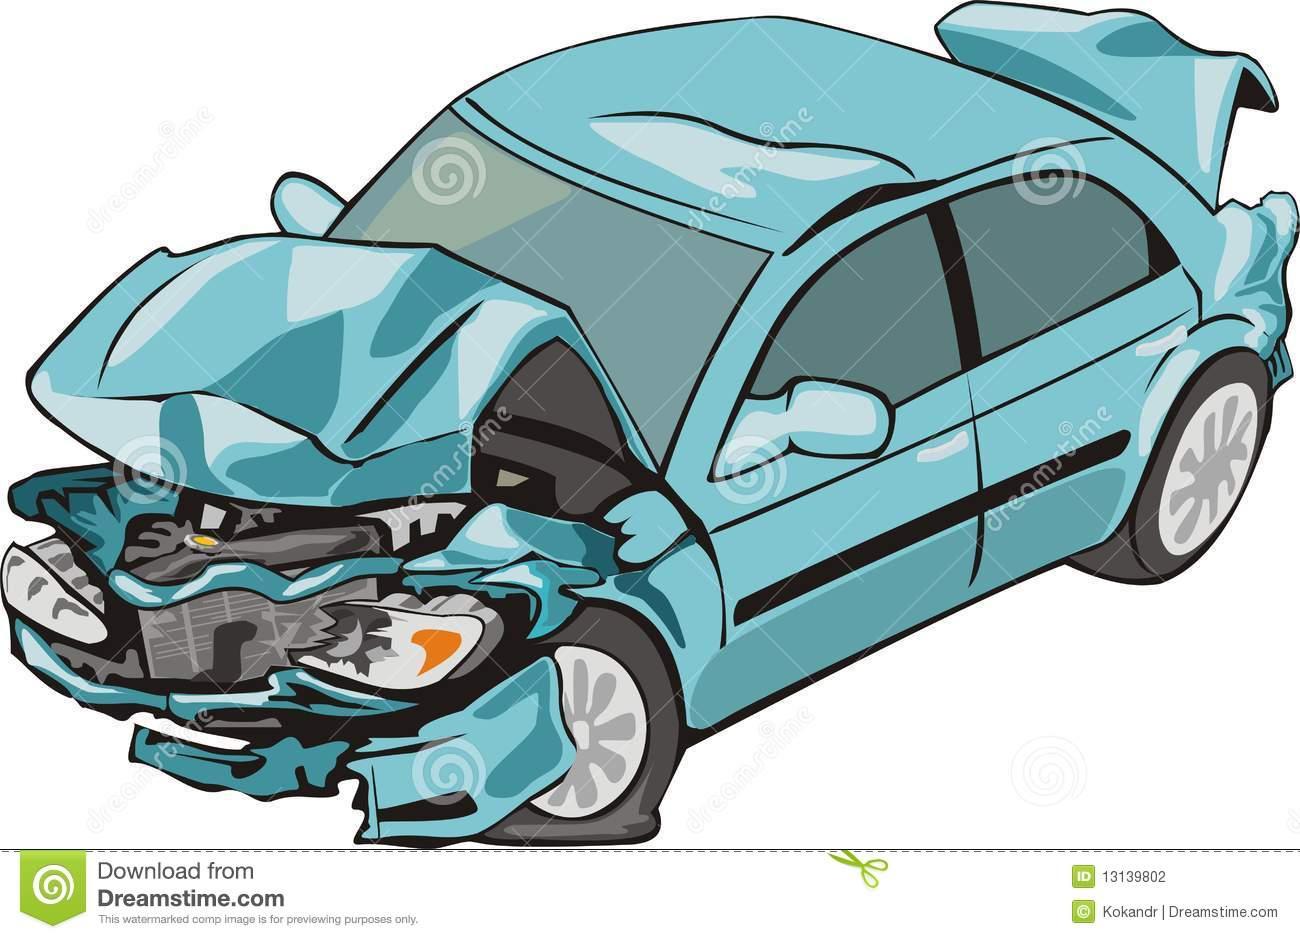 Car damage clipart.